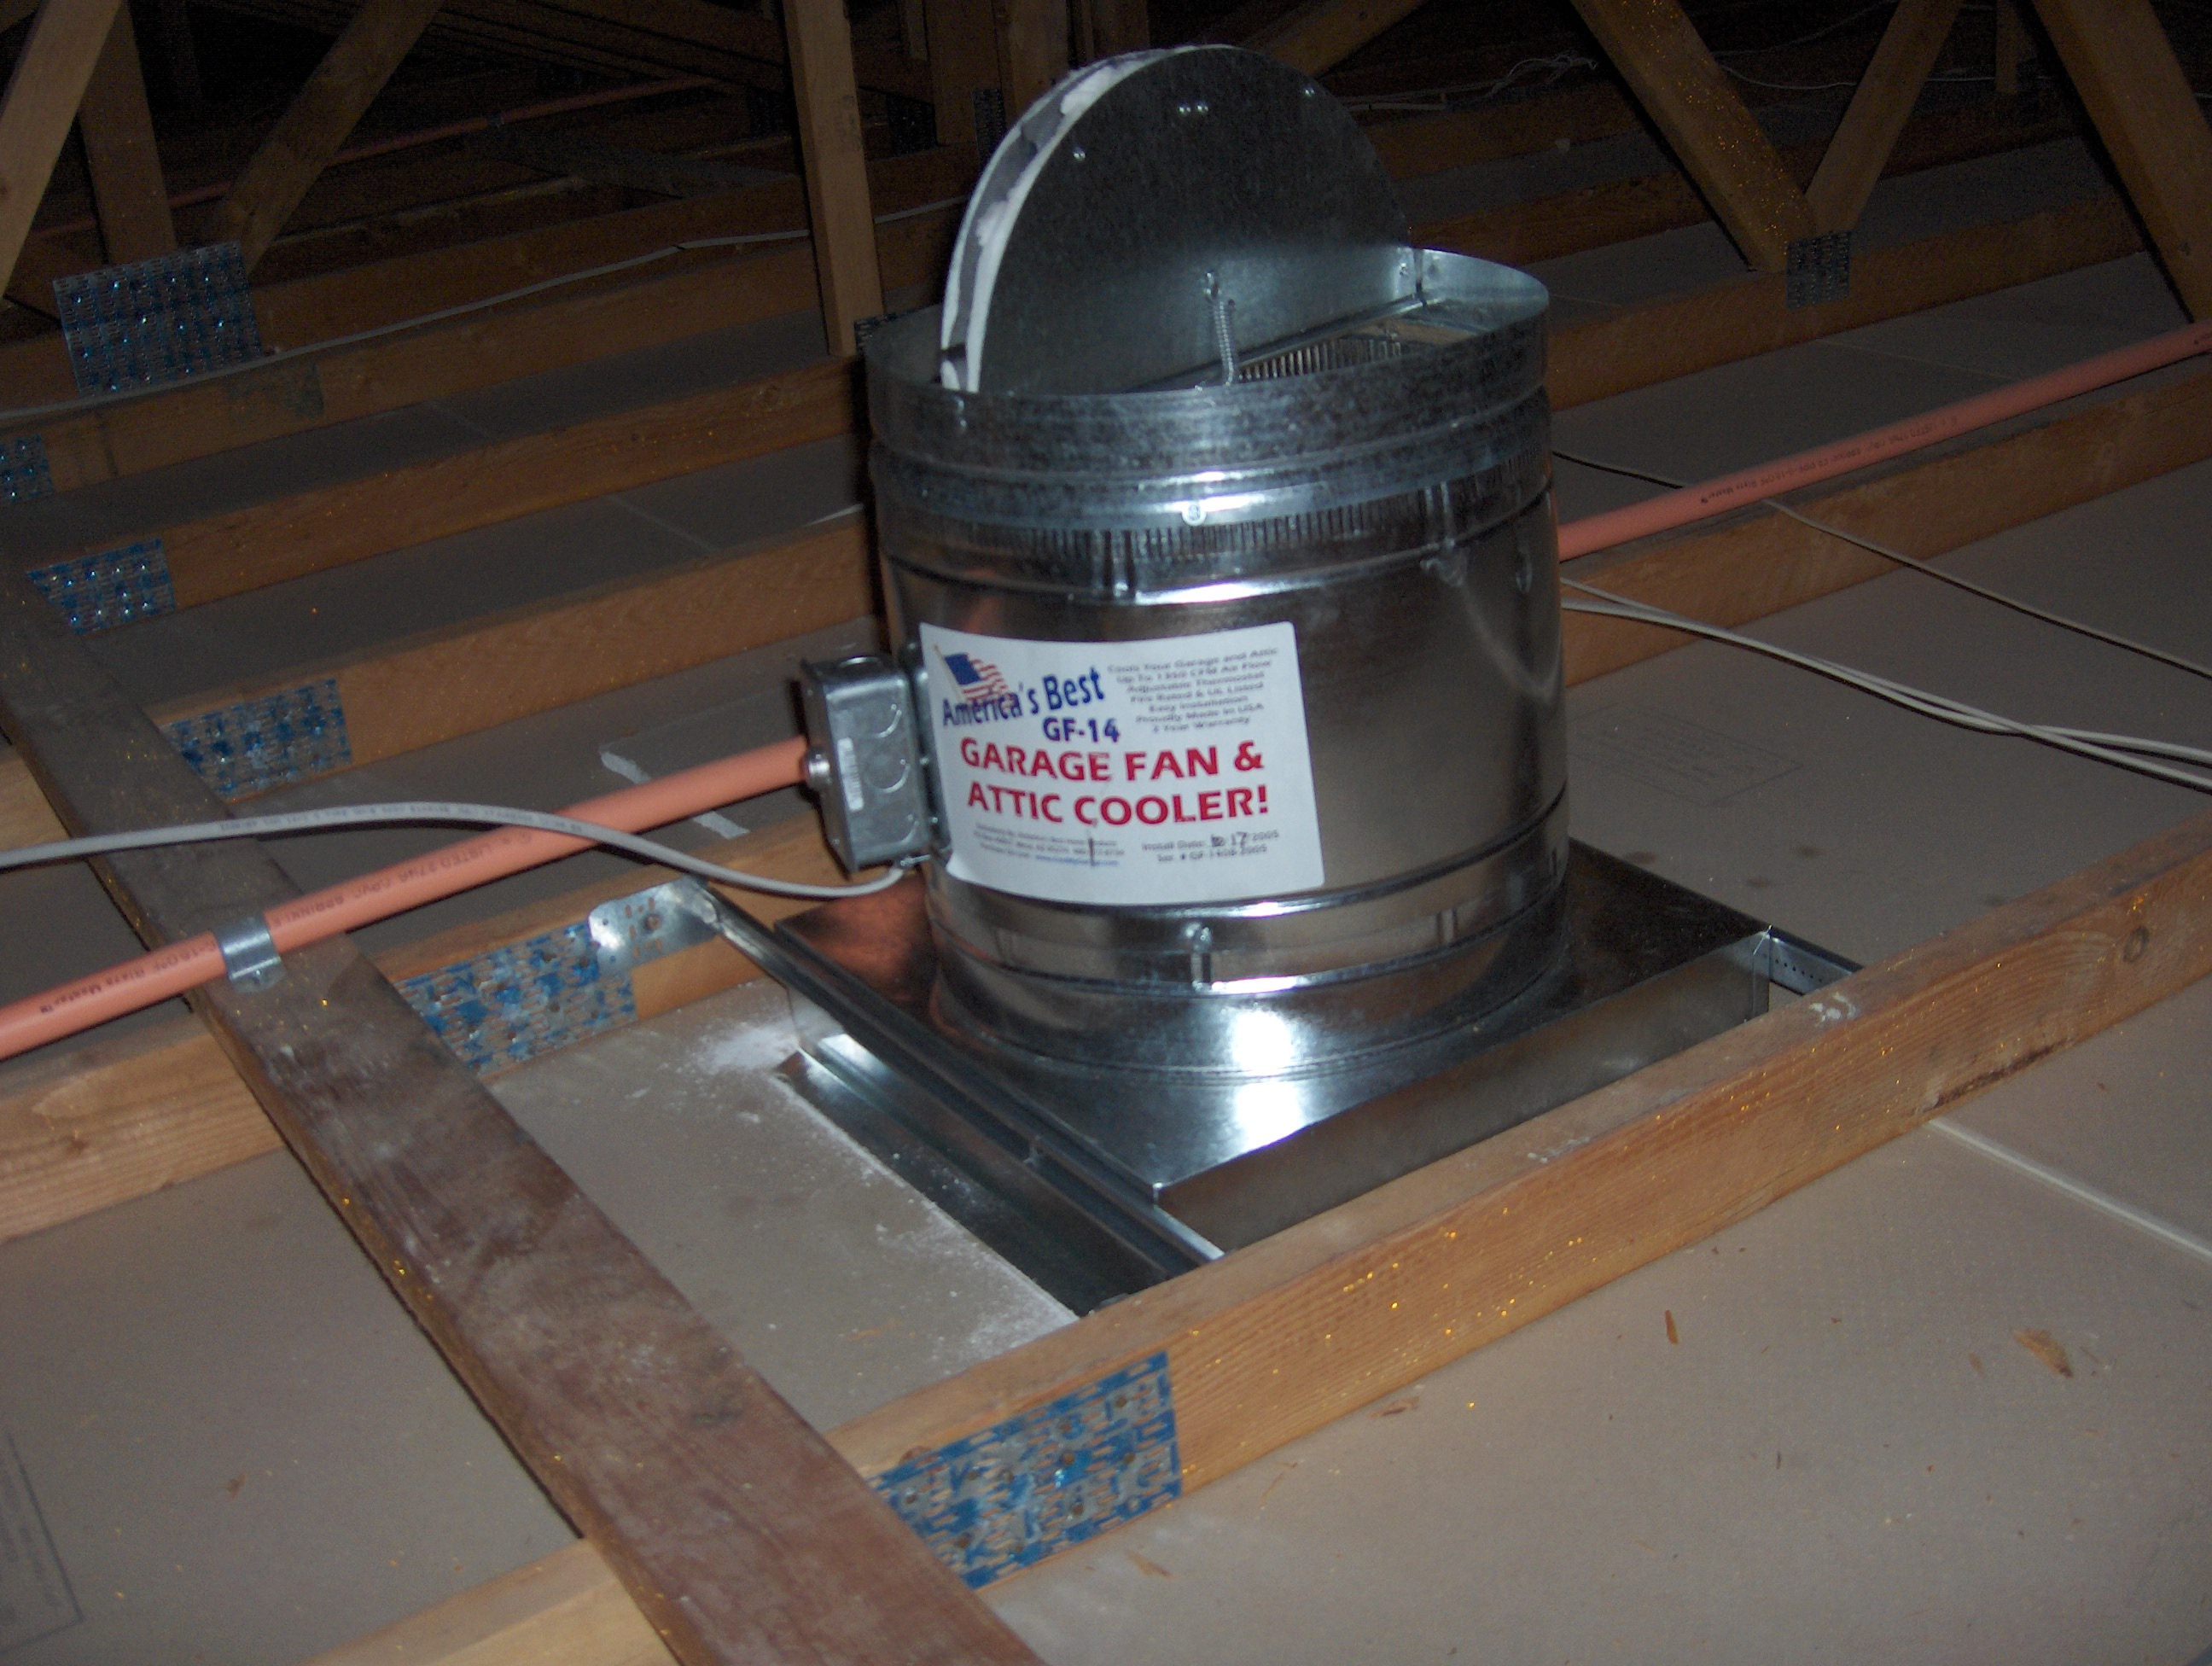 gf 14 garage fan and attic cooler